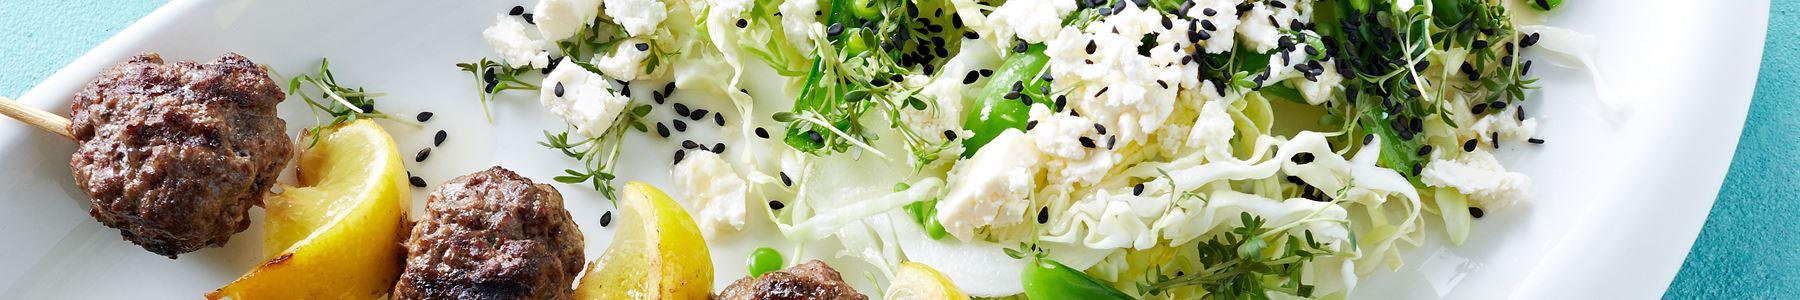 Hurtig + Salater + Grill